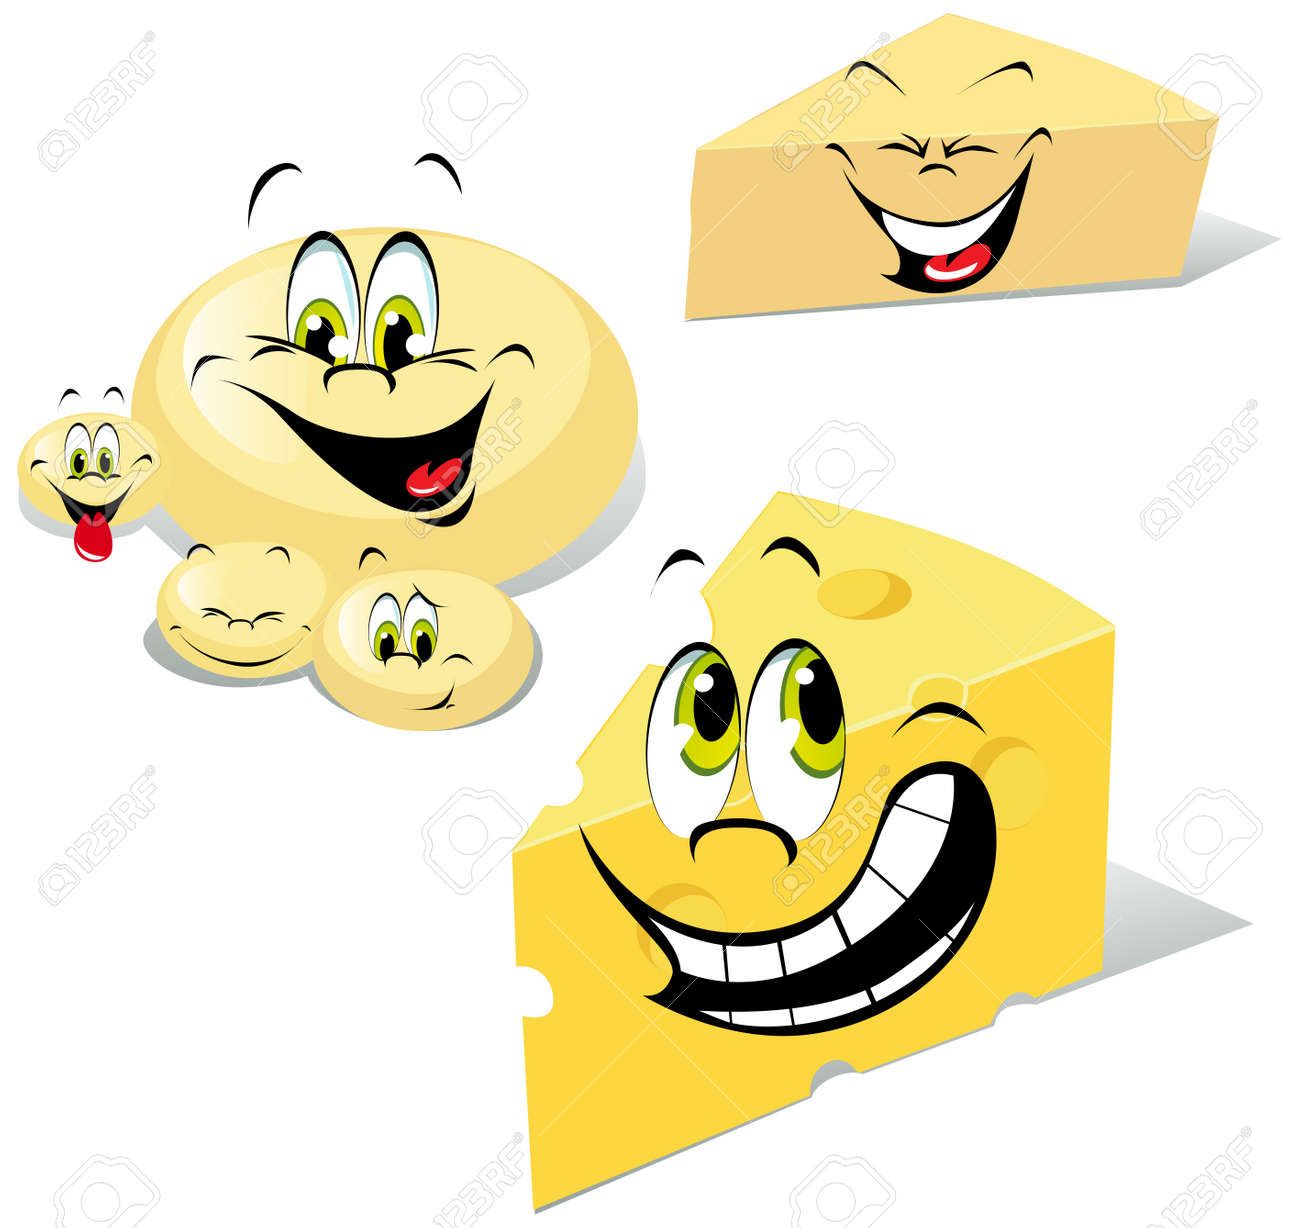 cheeses cartoon Stock Vector - 15094543